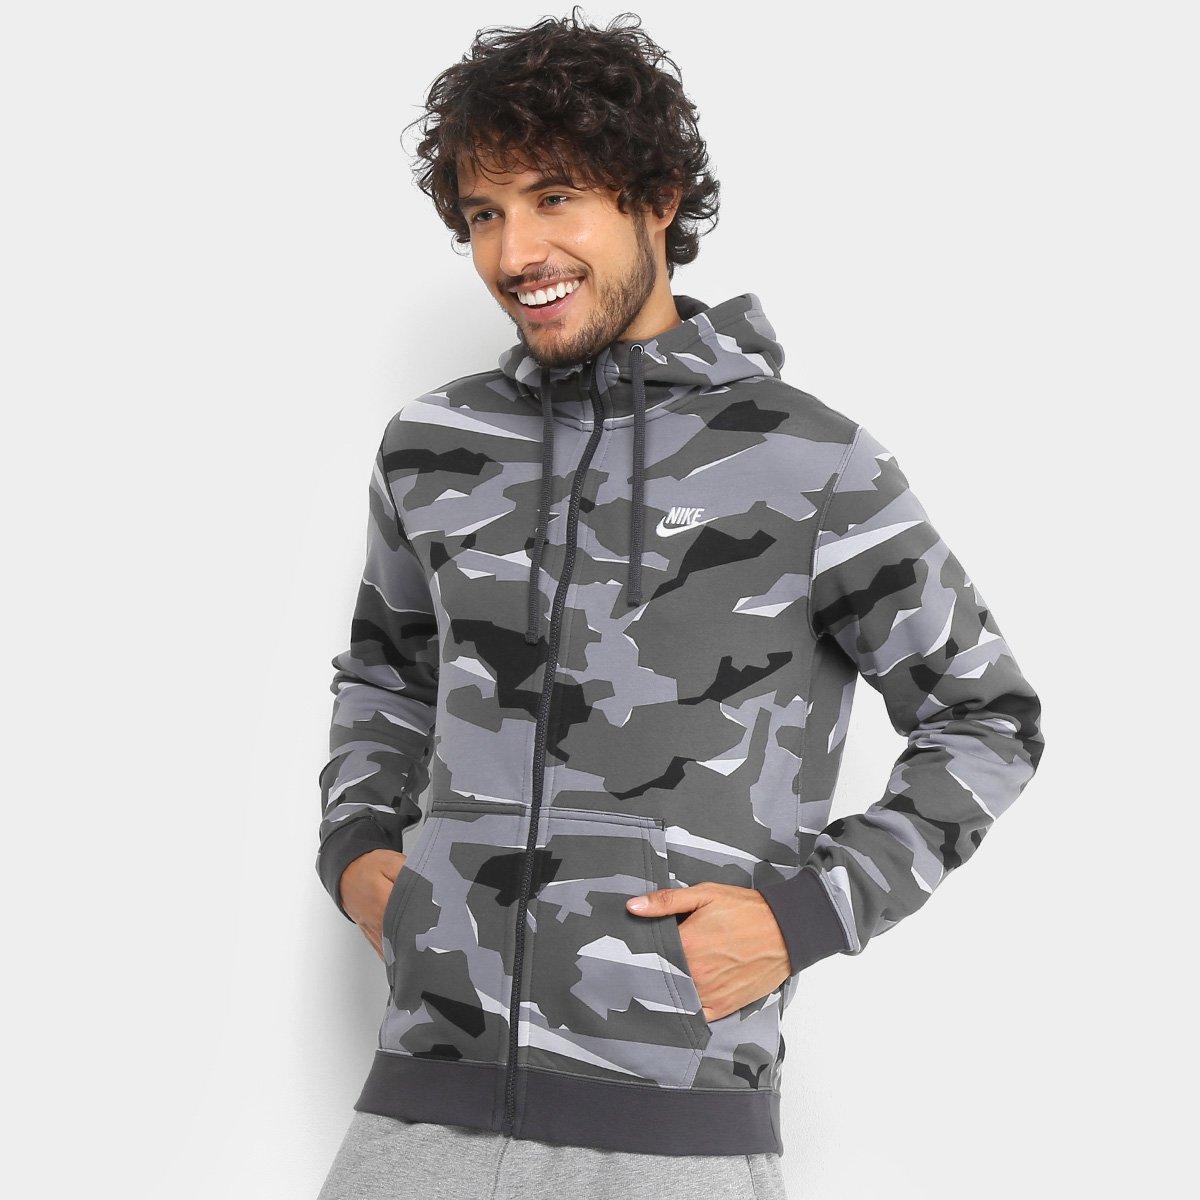 Jaqueta Estampada Nike Nsw Club Camo Hoodie Masculina - Compre Agora ... 5356a09ef2ea5